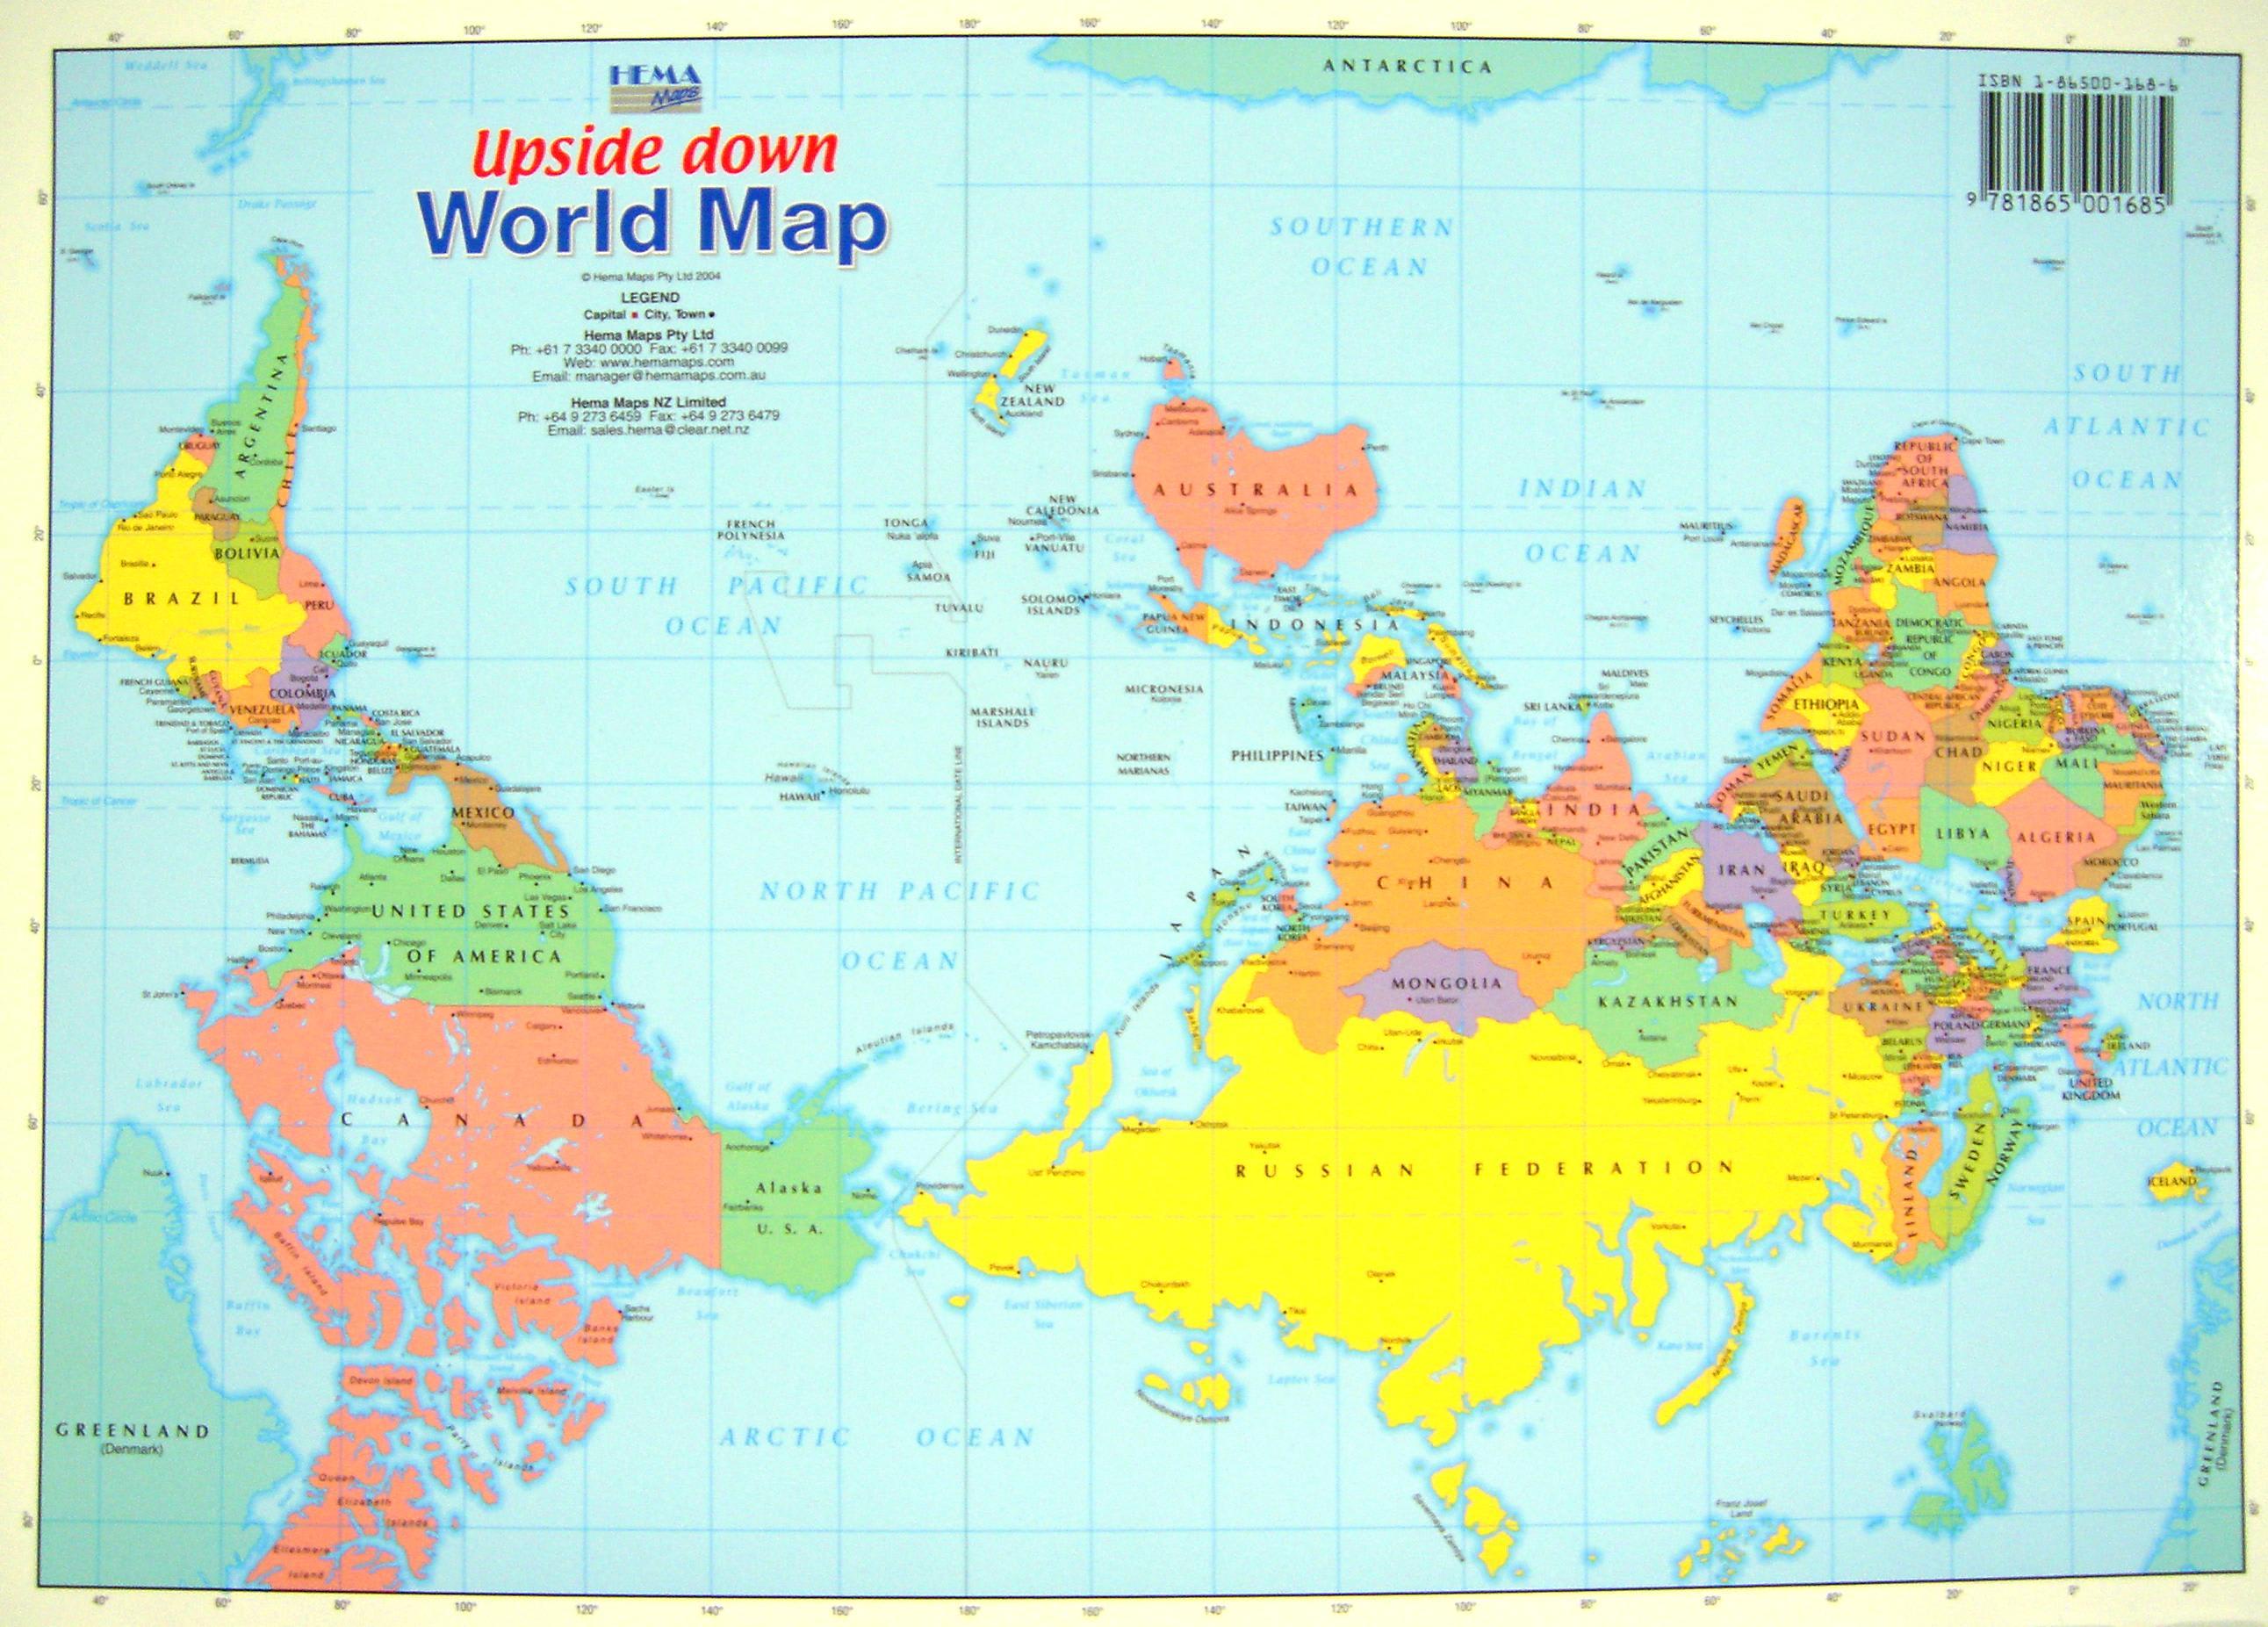 Upside Down World Map : 日本地図 ポスター : 日本